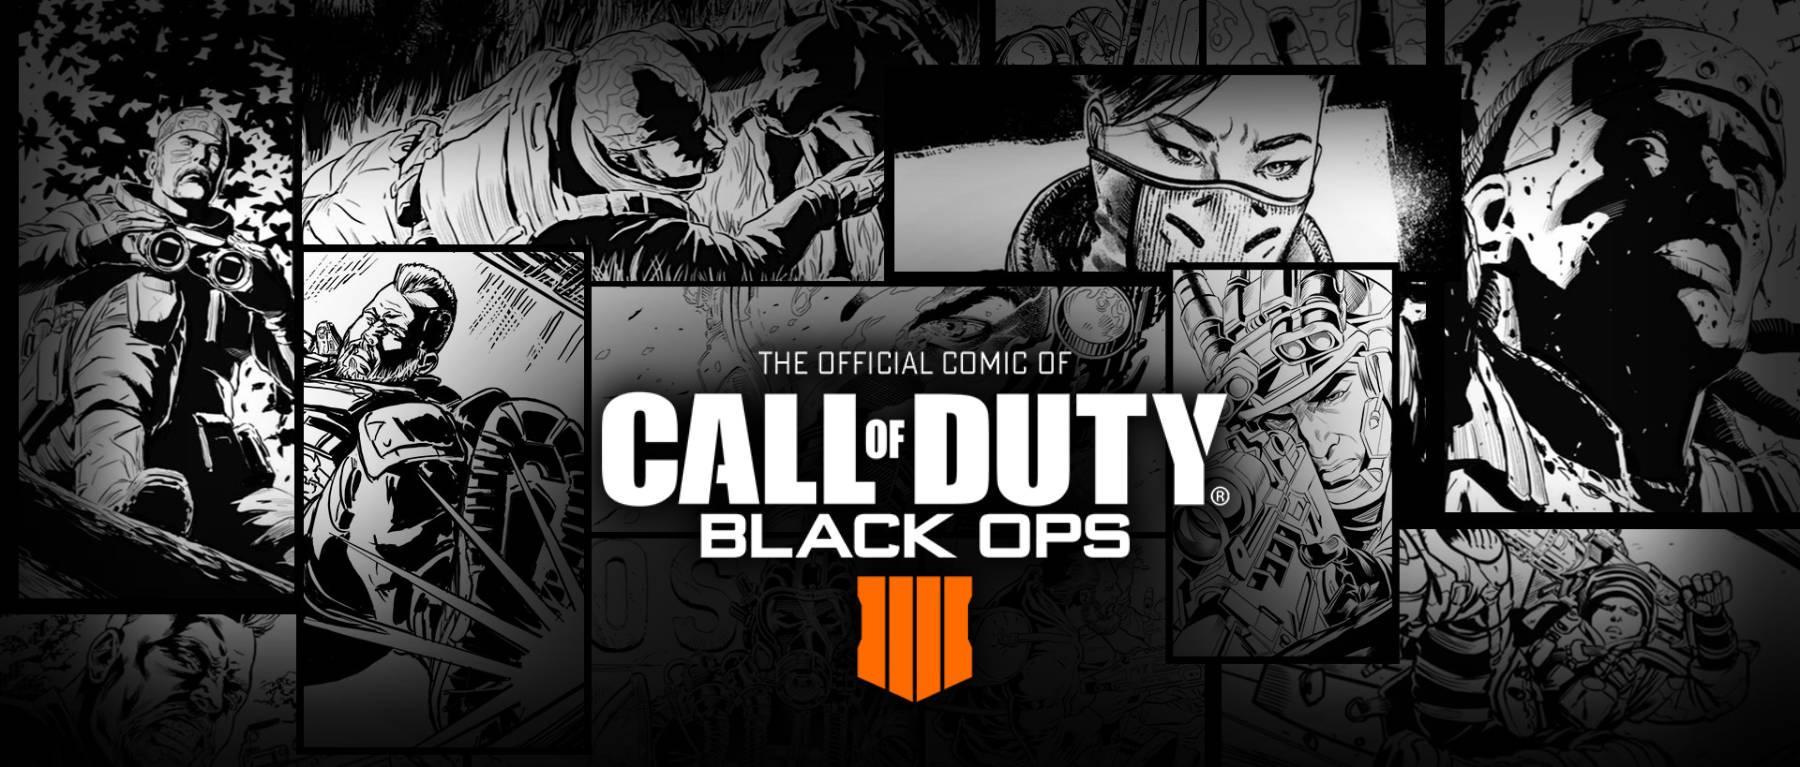 Call of Duty: Black Ops 4, ya tiene su comic oficial